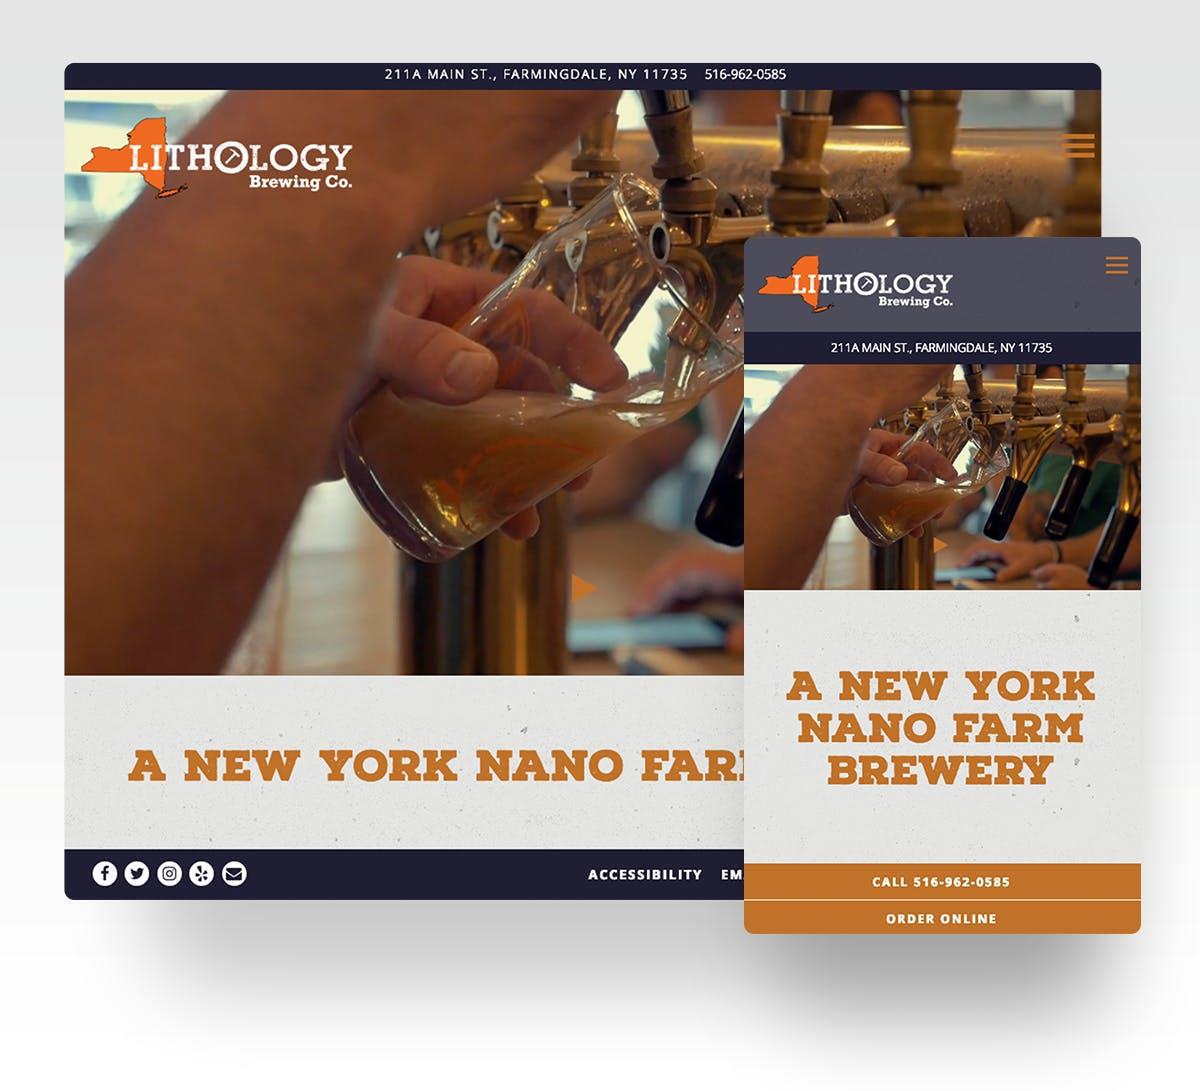 Lithology Brewing Co.'s website in desktop and mobile